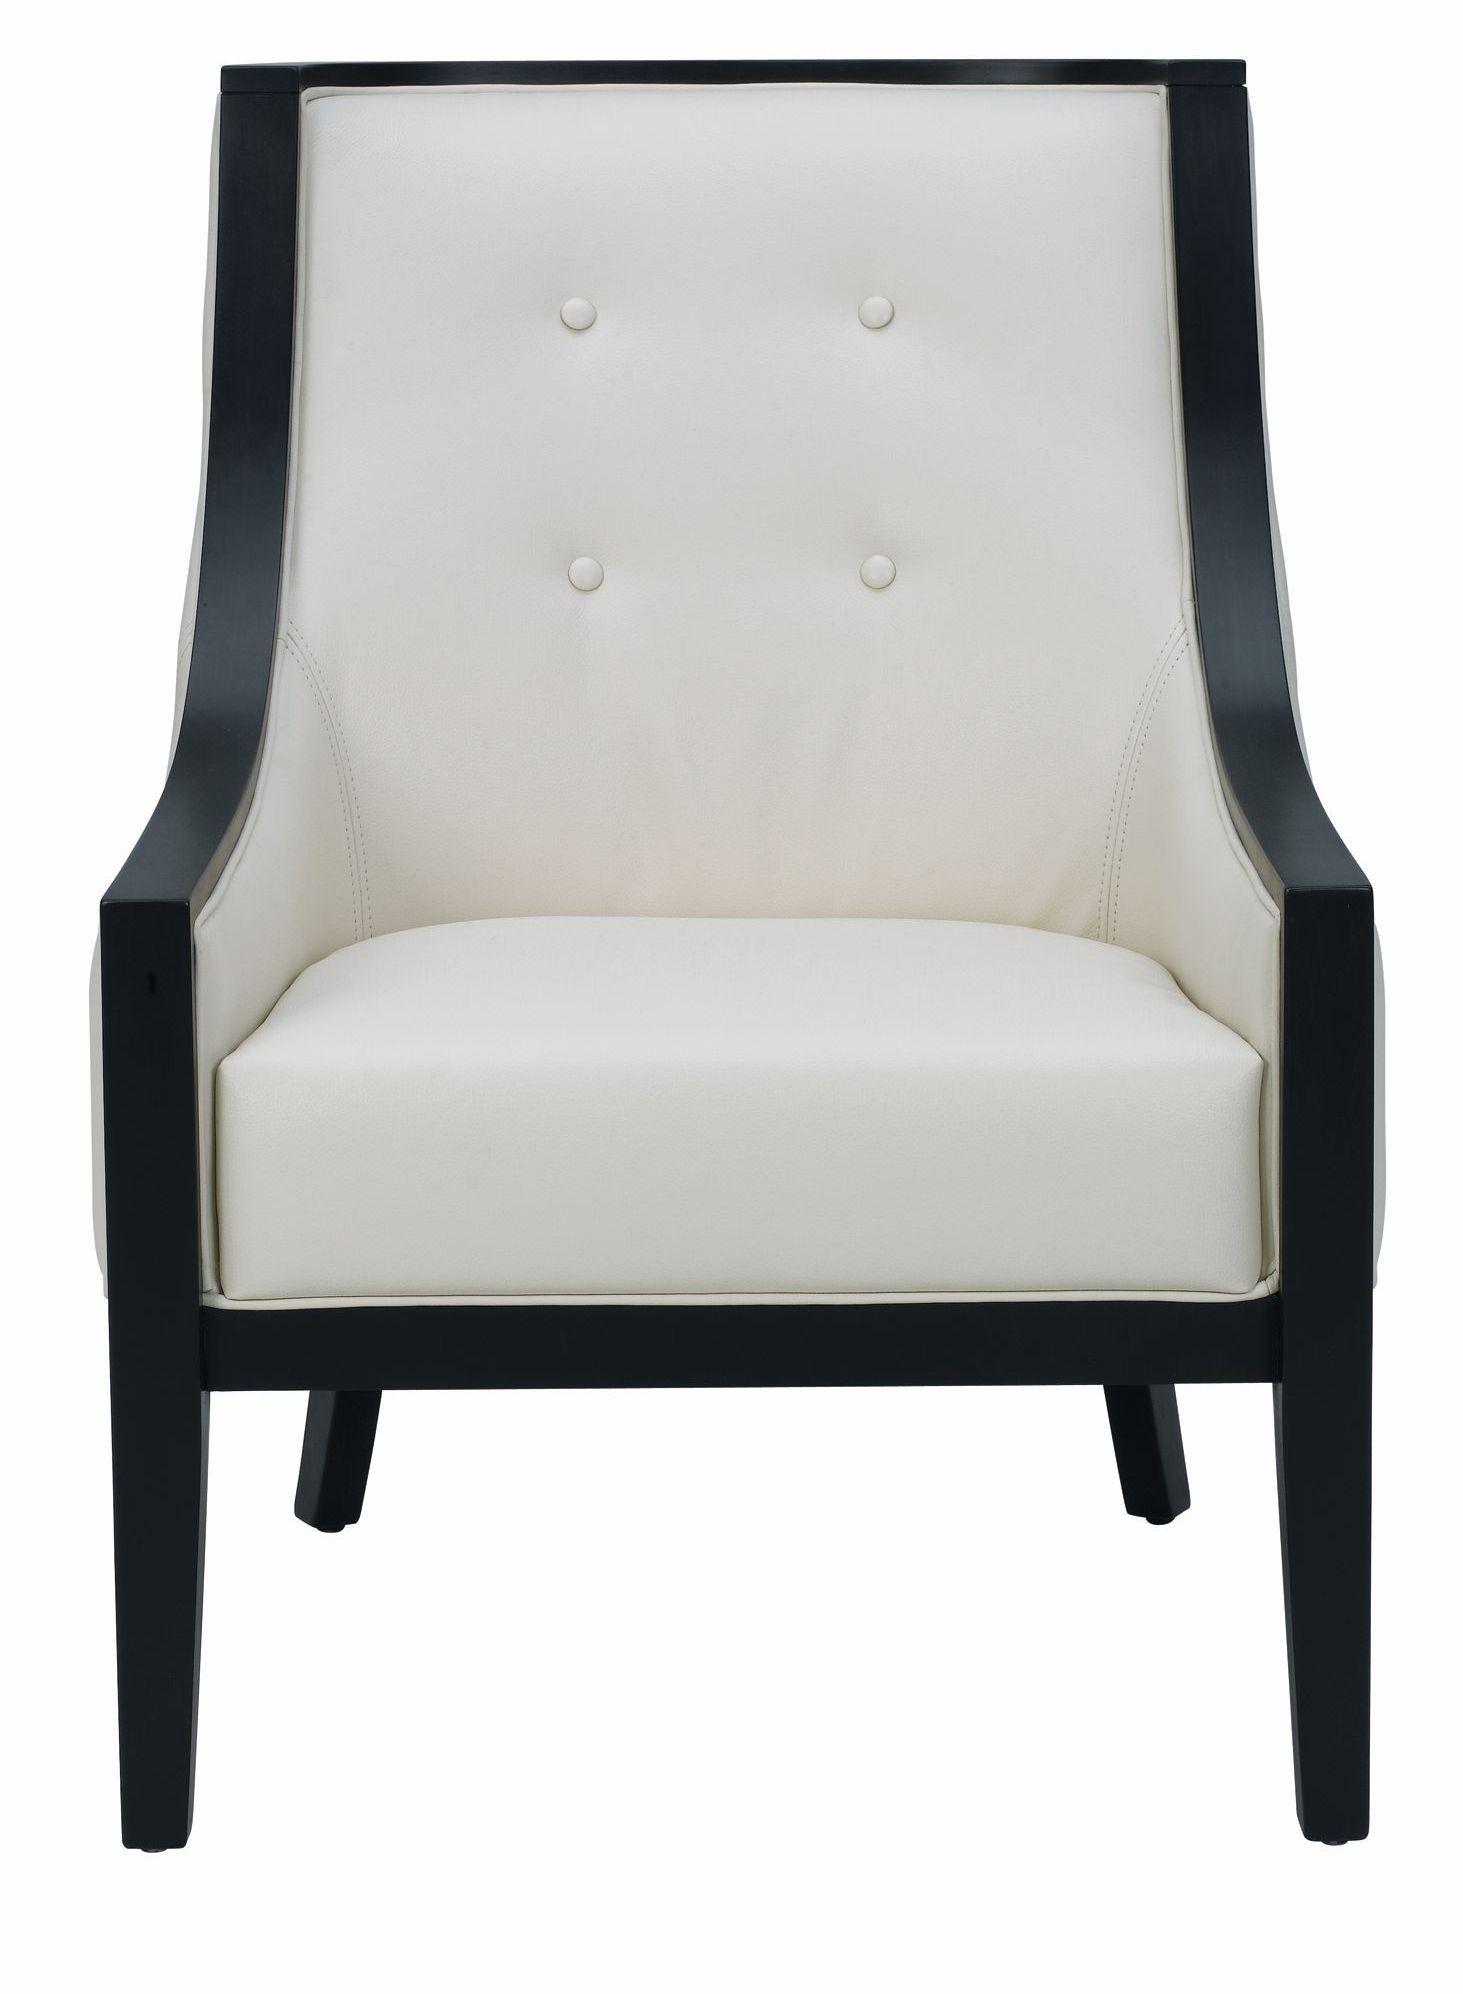 Cyrano Cream Leather Arm Chair from Sunpan (27233 ...